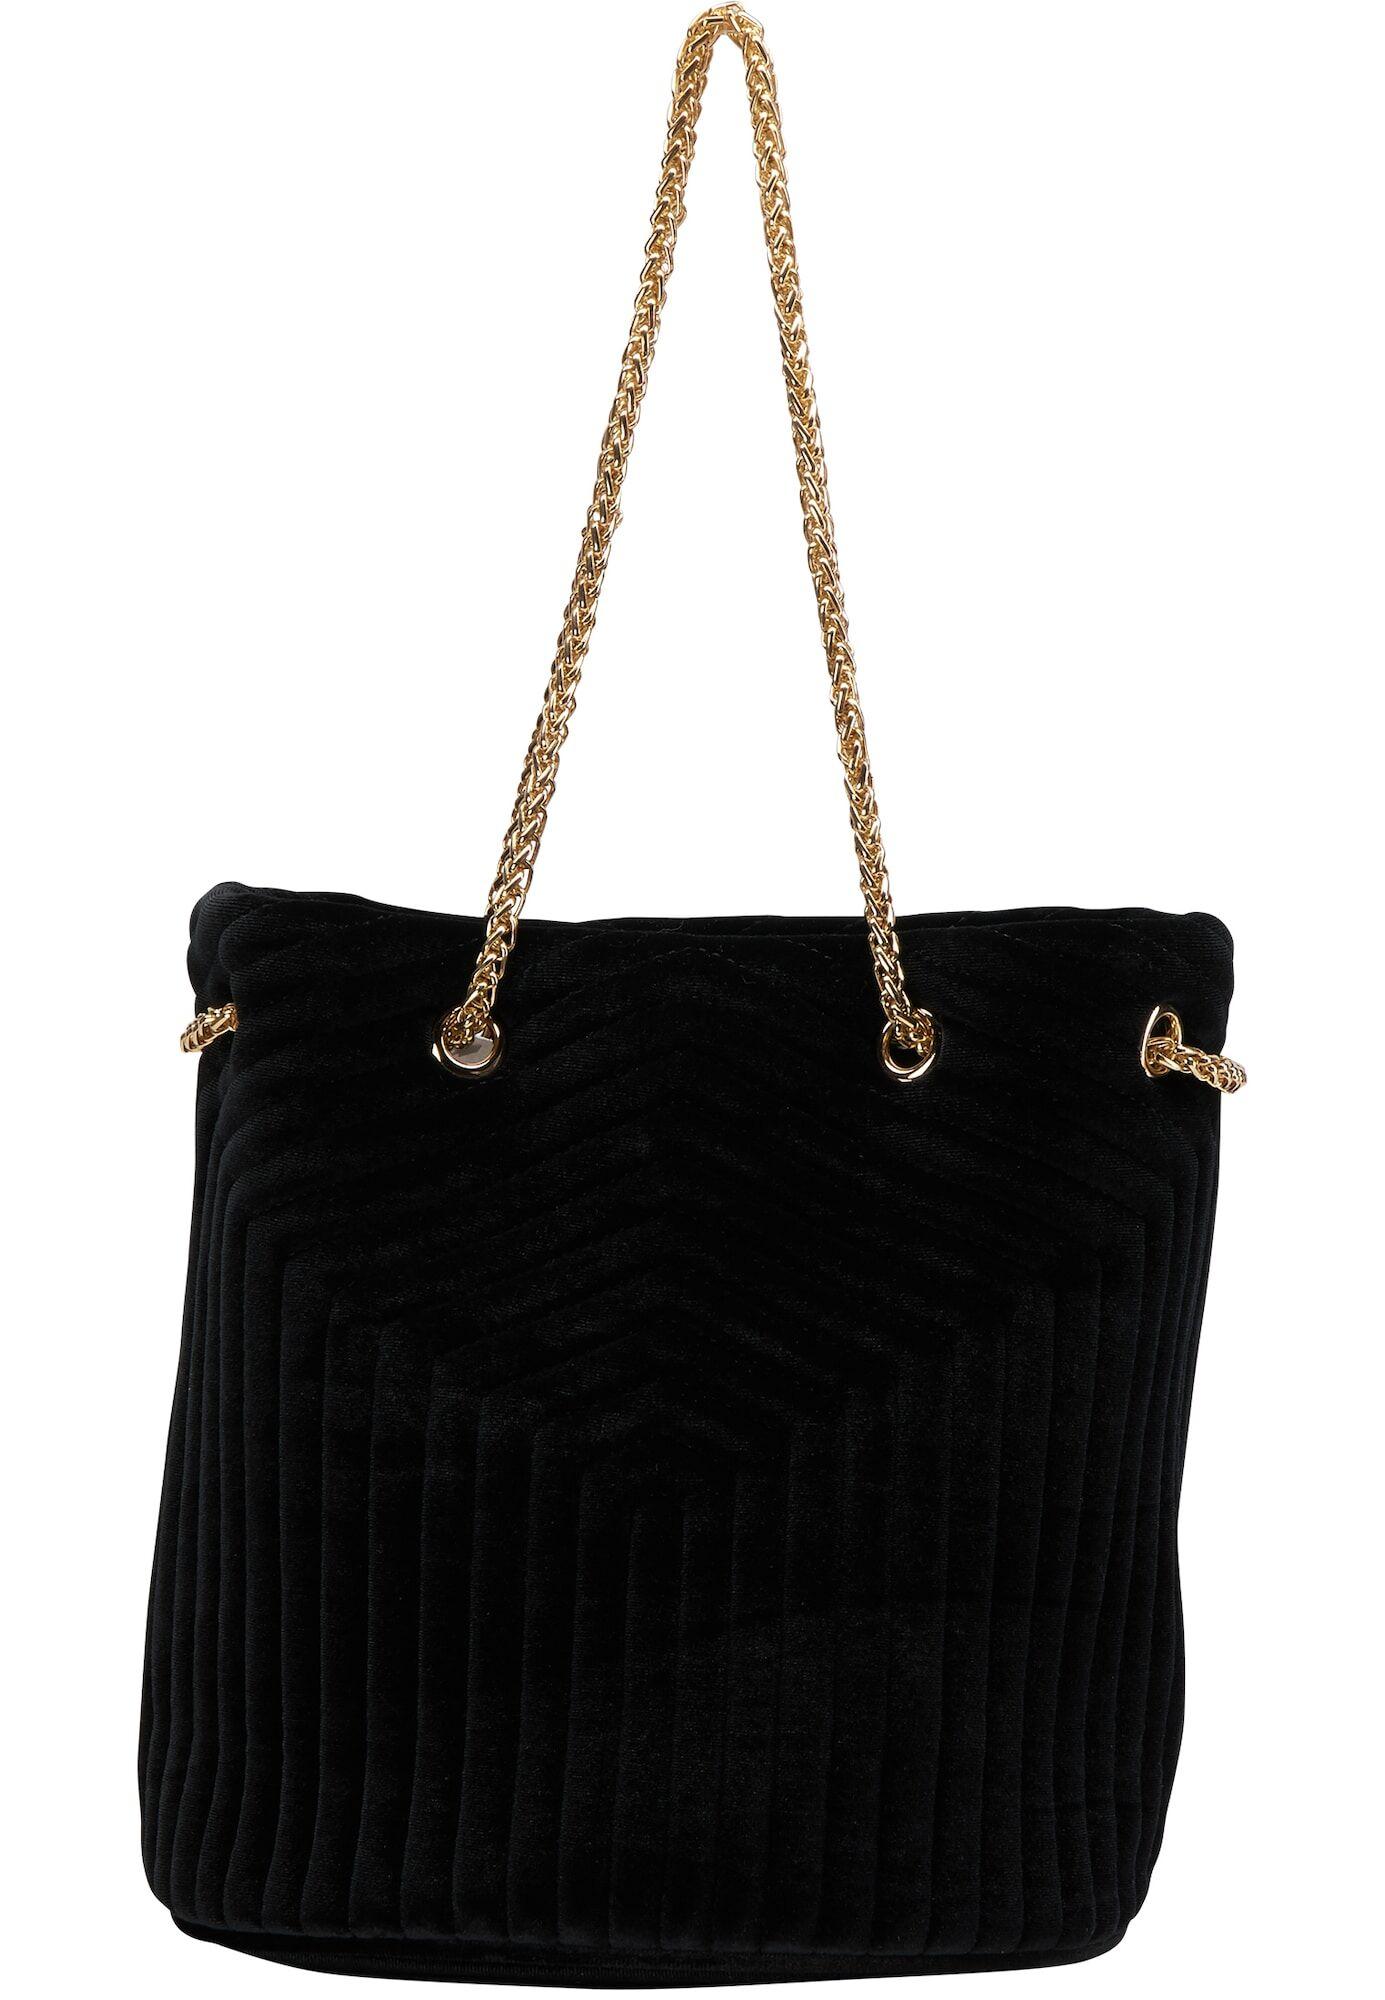 faina Sac bandoulière  - Noir - Taille: One Size - female